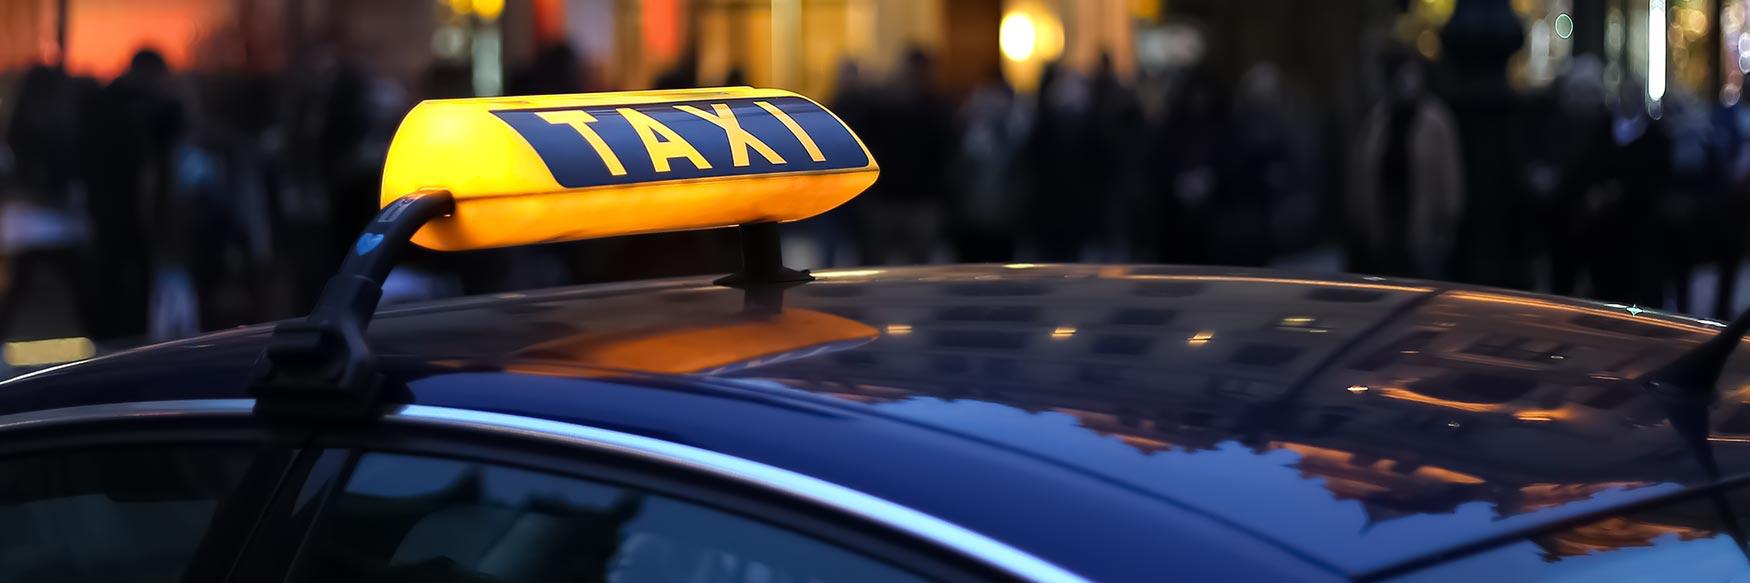 Taxi in Prague, Czechia